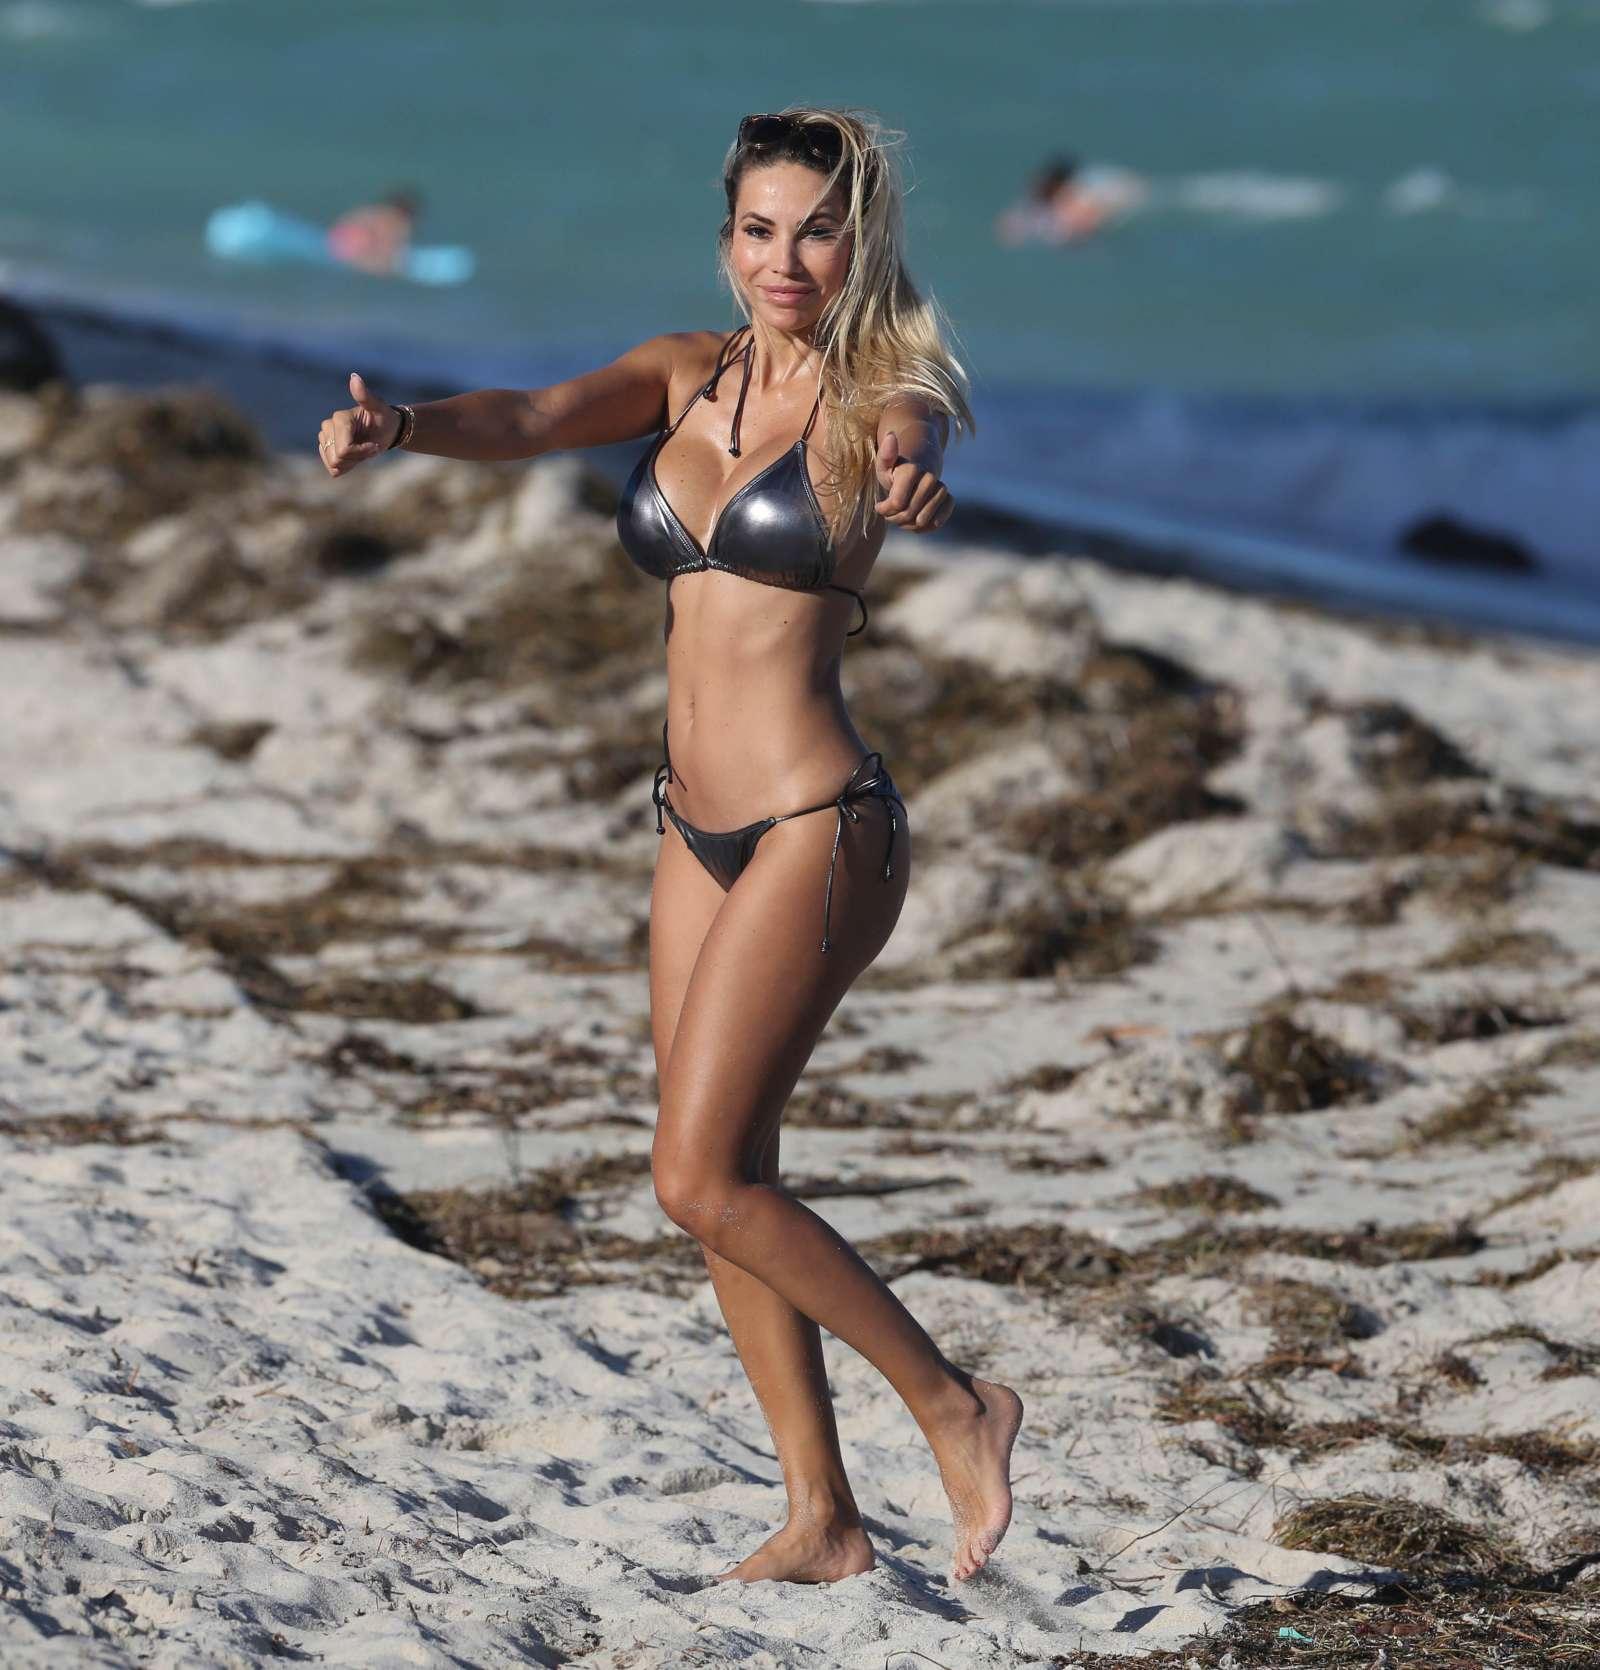 Maria Hering 2017 : Maria Hering in Bikini 2017 -10